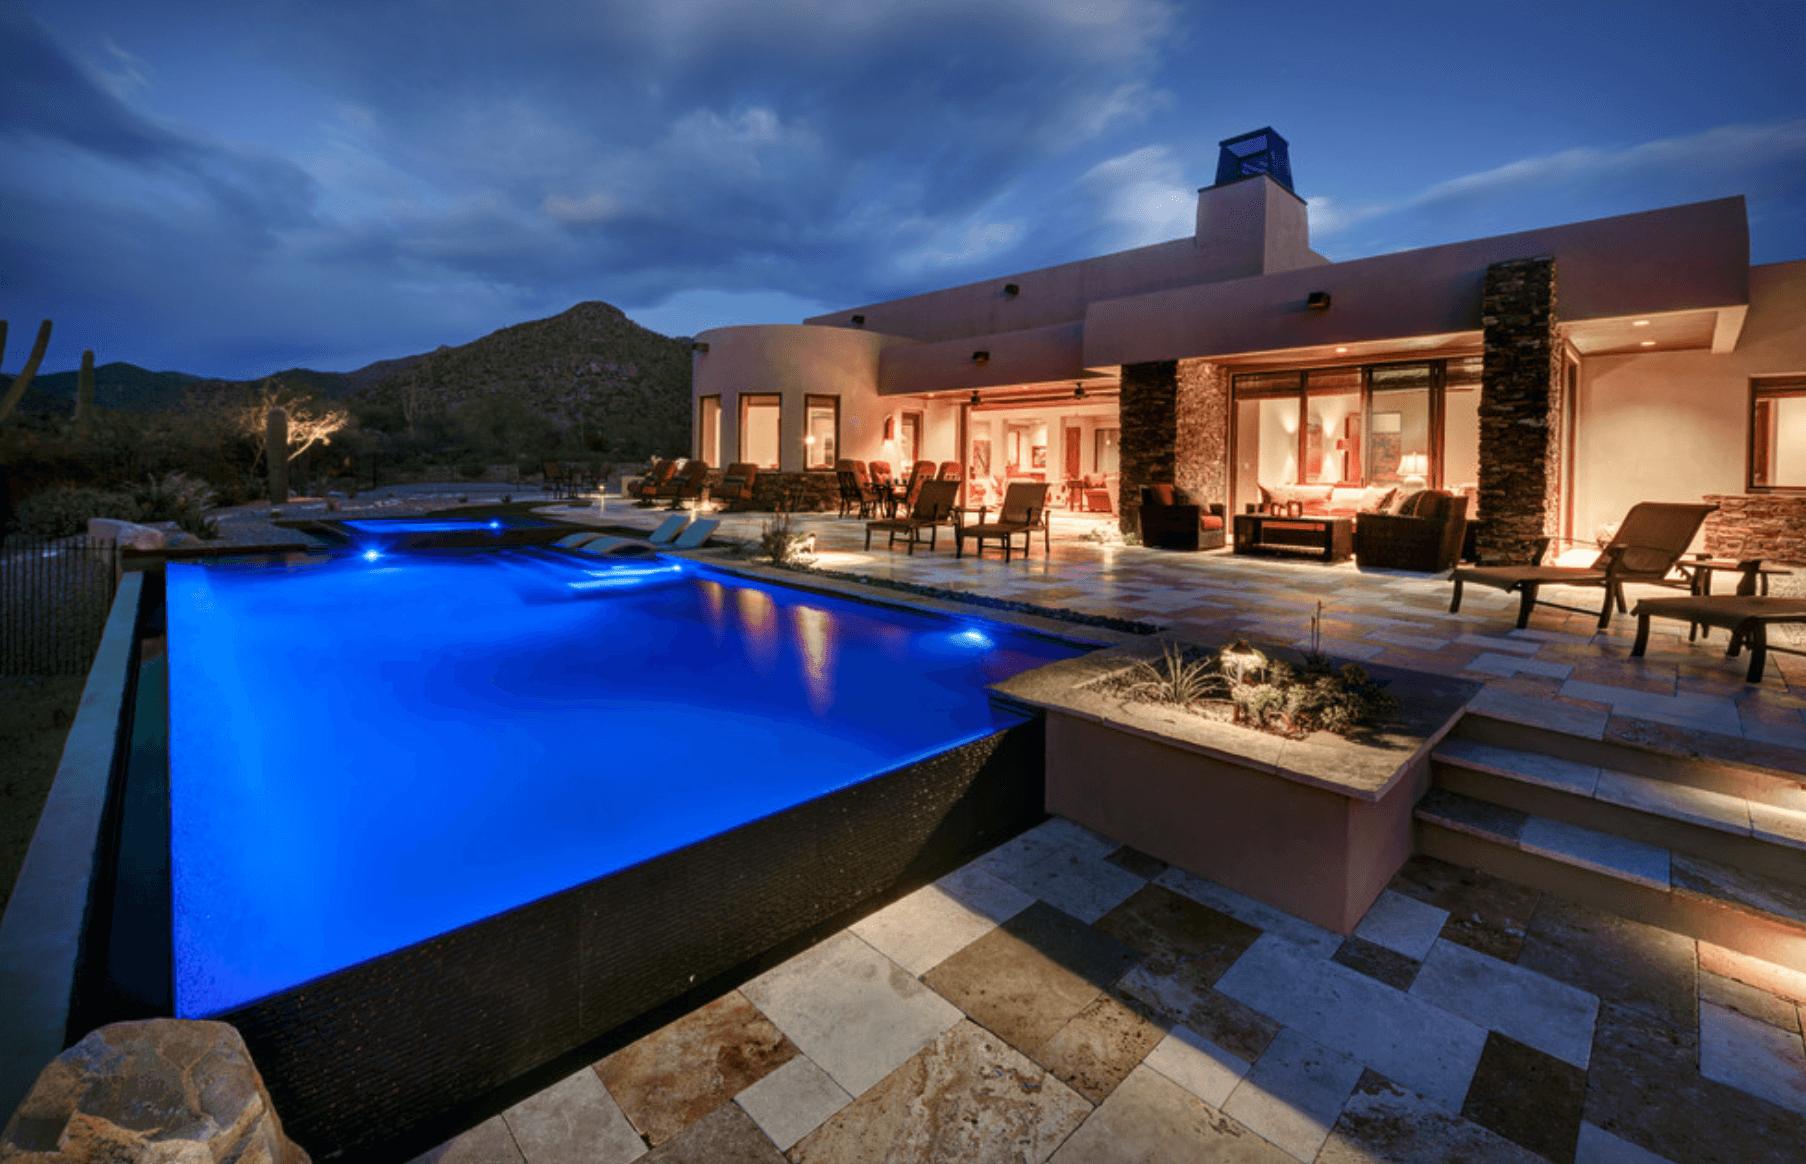 Casa de campo como projetar arquidicas for Casa moderna con piscina